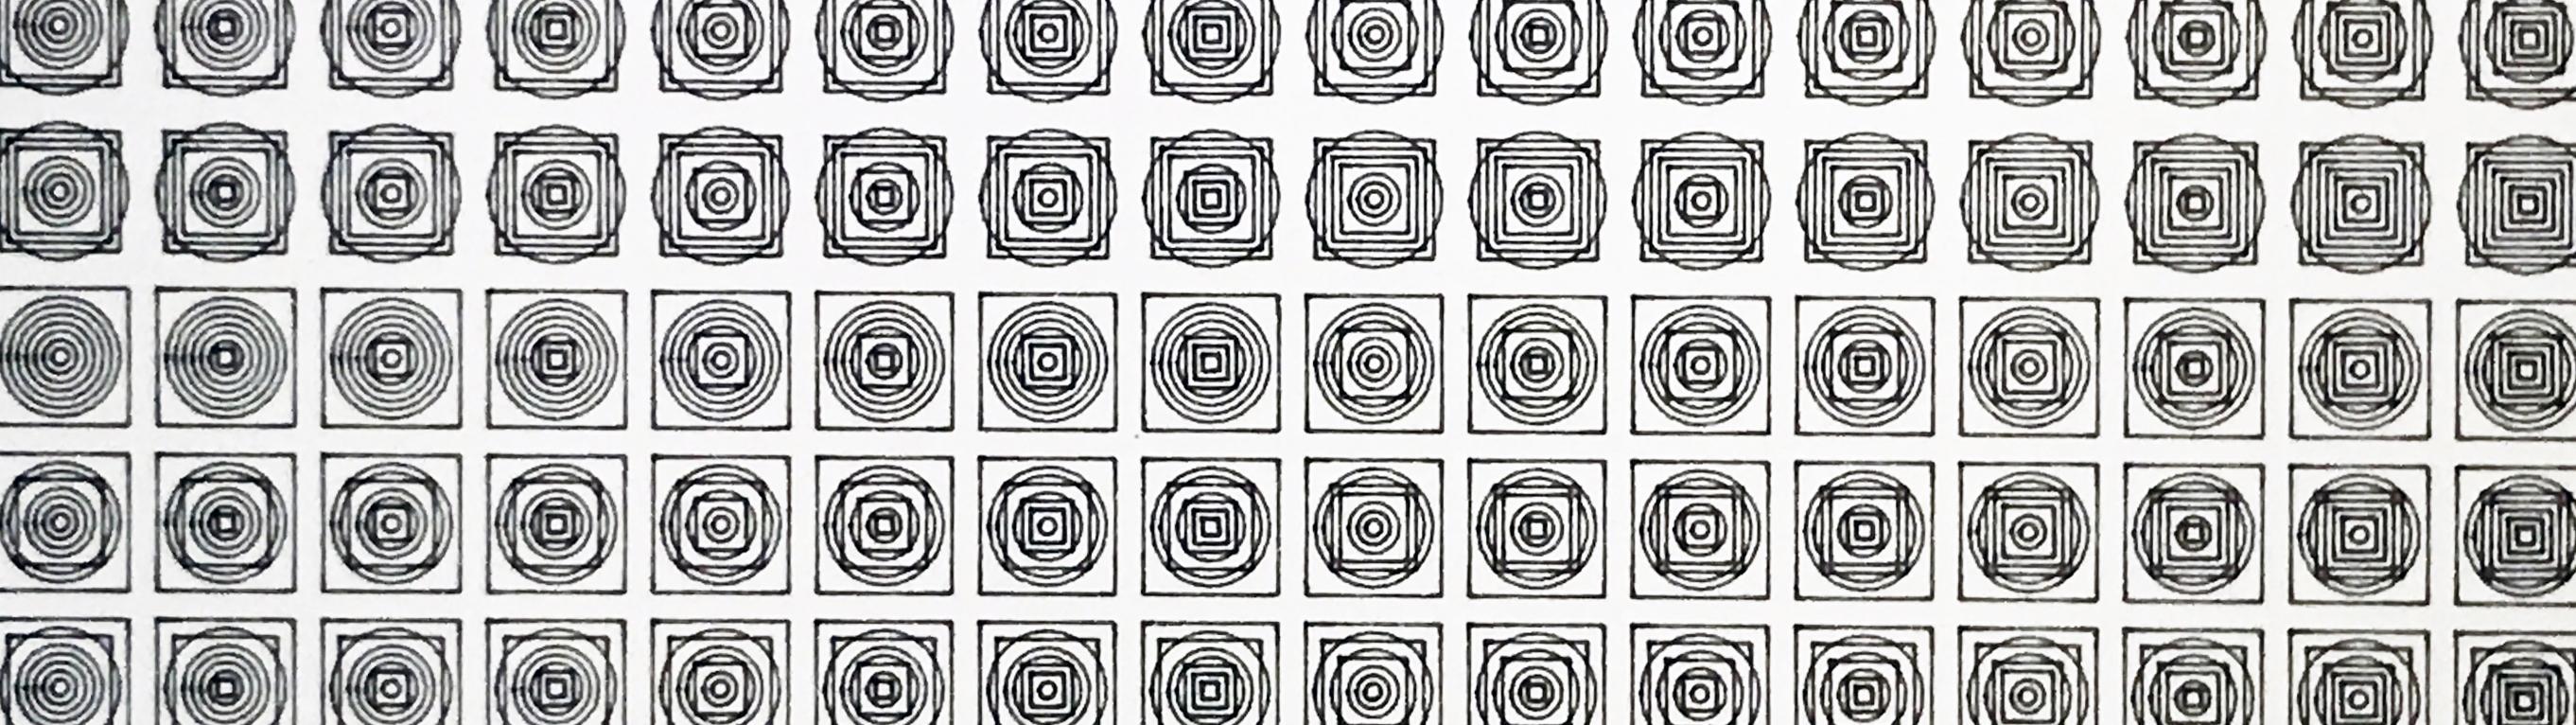 Vierkanten en cirkels